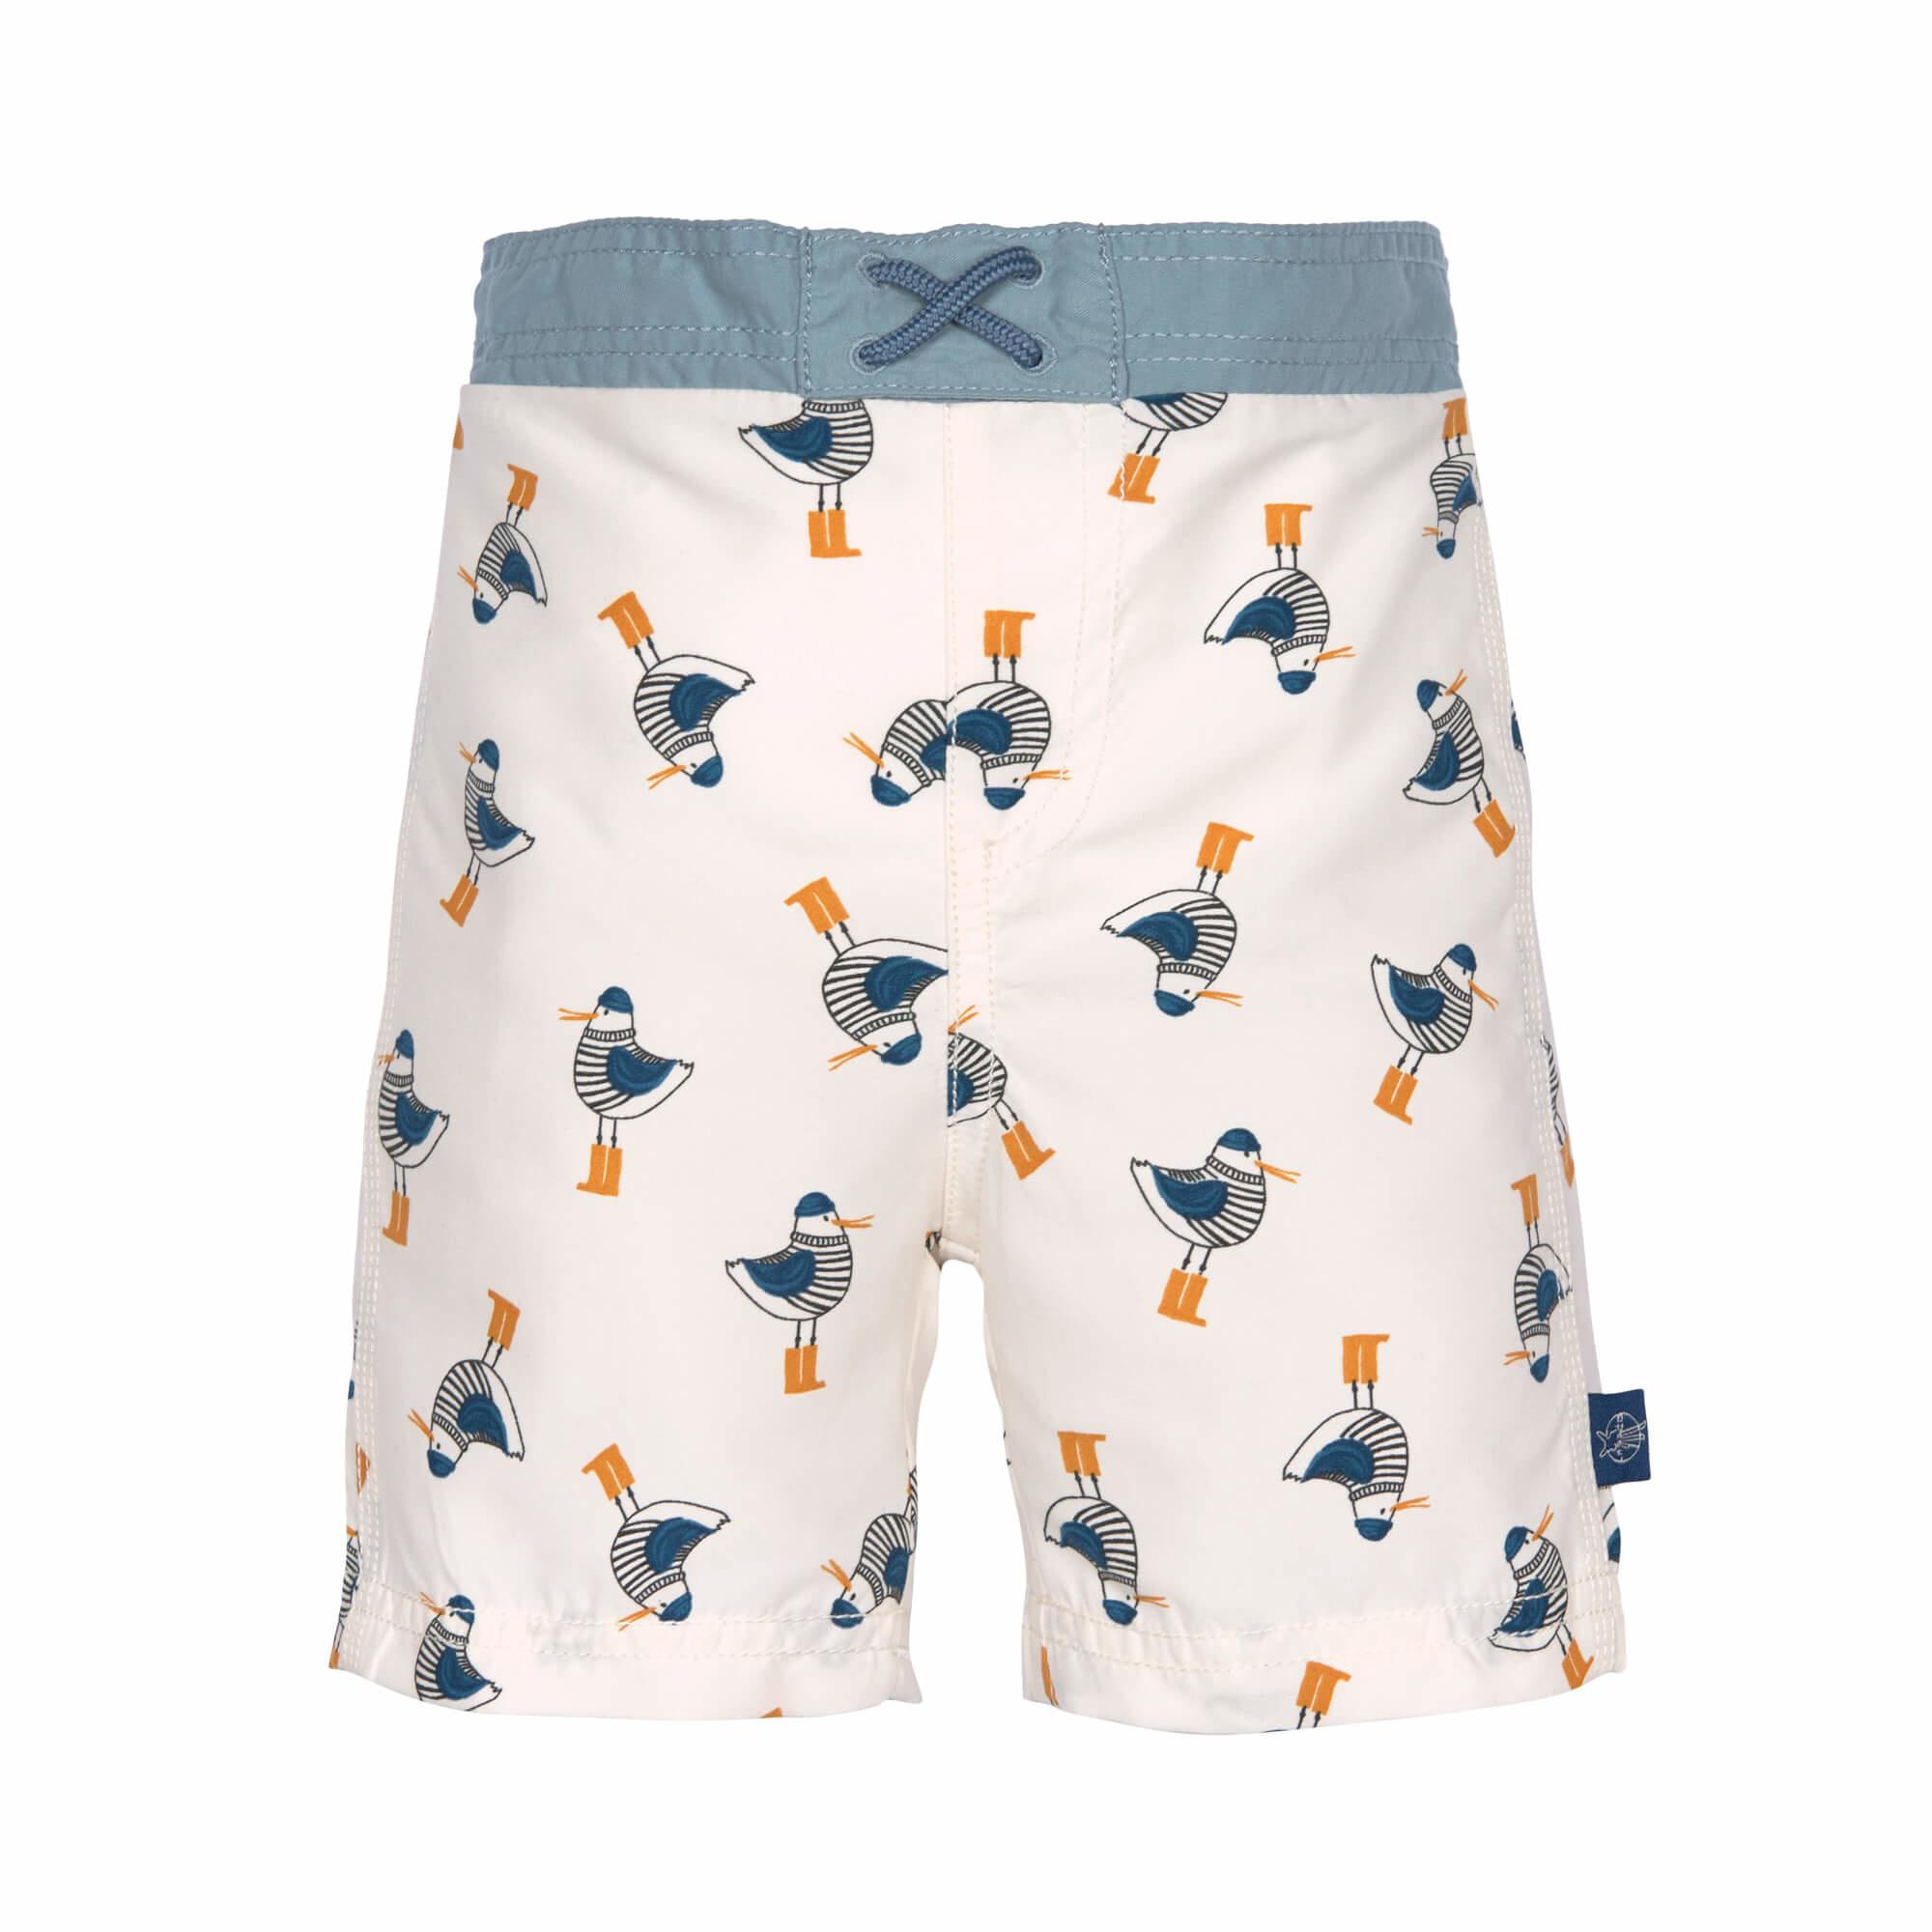 Lässig Splash & Fun Board Shorts / zwemshorts jongens Mr. Seagull